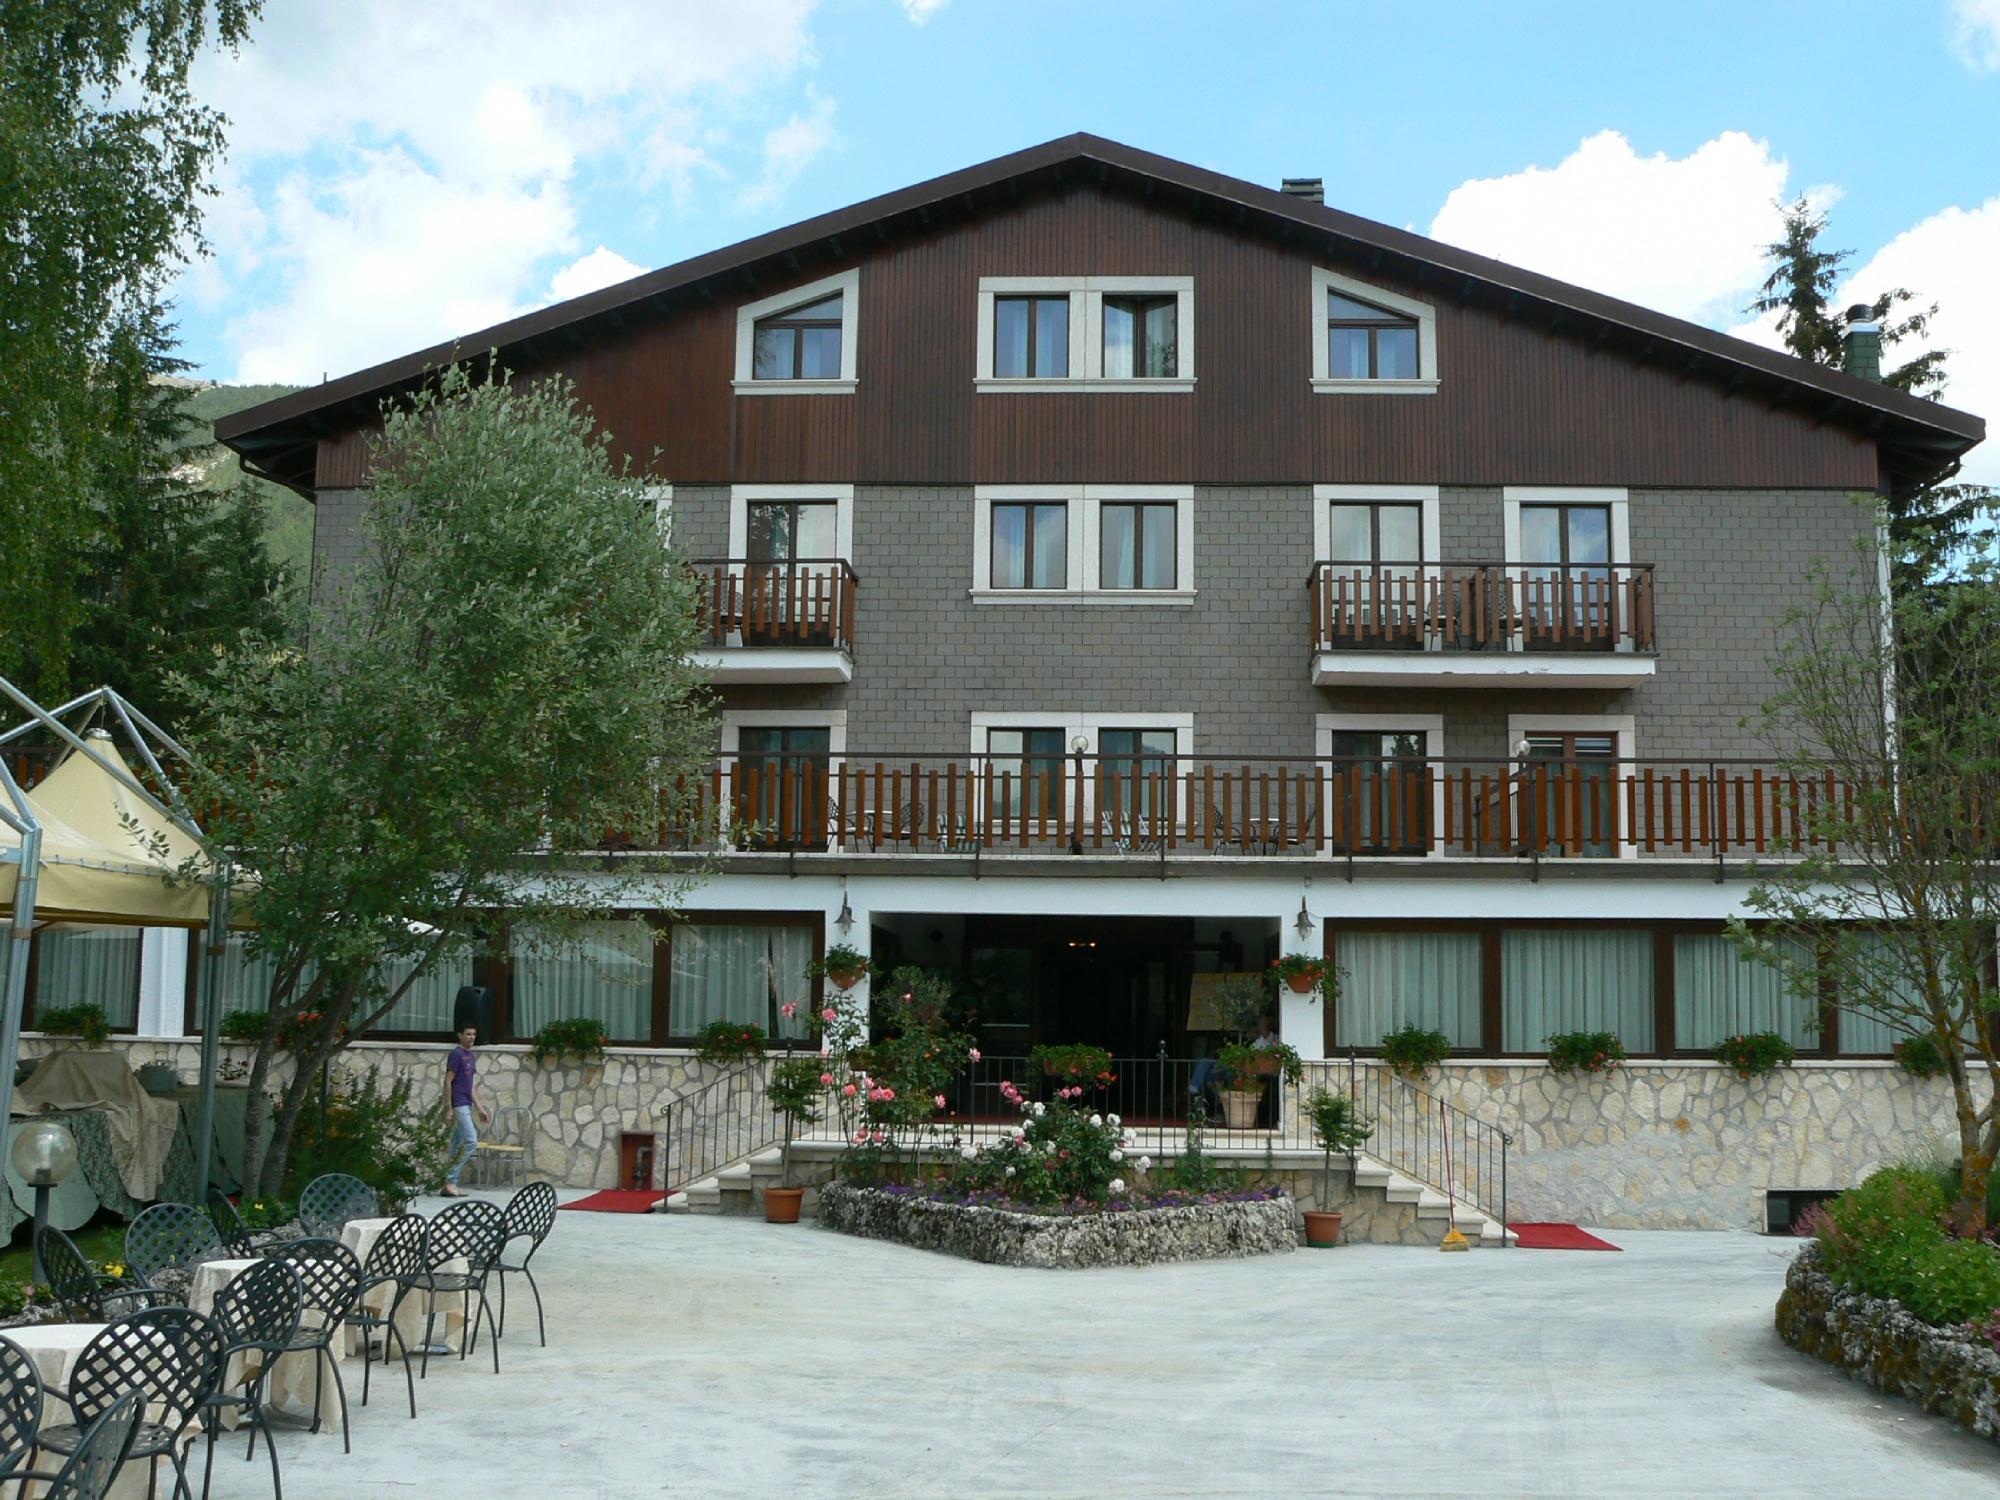 Pescasseroli Italy  city images : Hotel Edelweiss Pescasseroli, Italy Hotel Reviews TripAdvisor